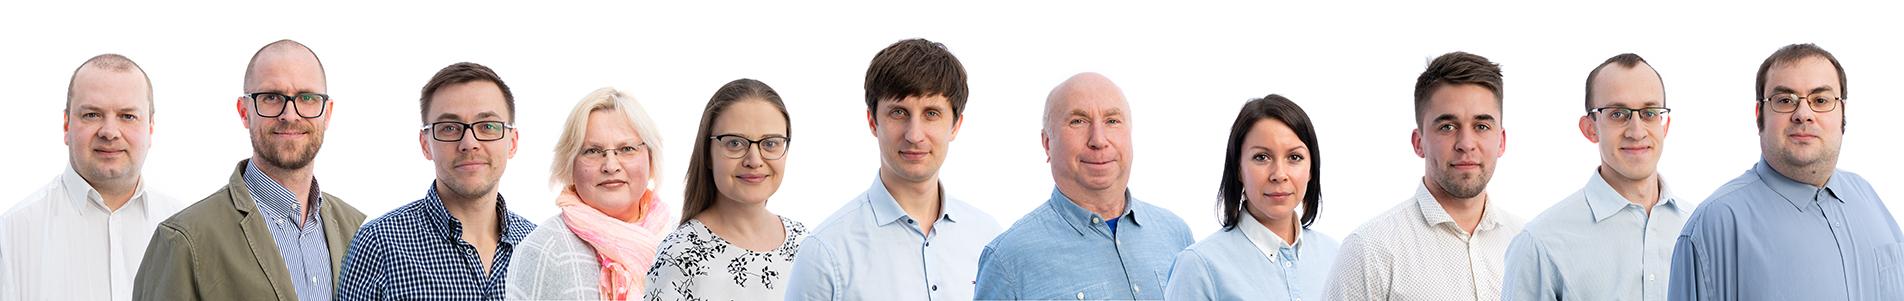 Ehitusprojektide koostamine - Inseneribüroo Urmas Nugin OÜ